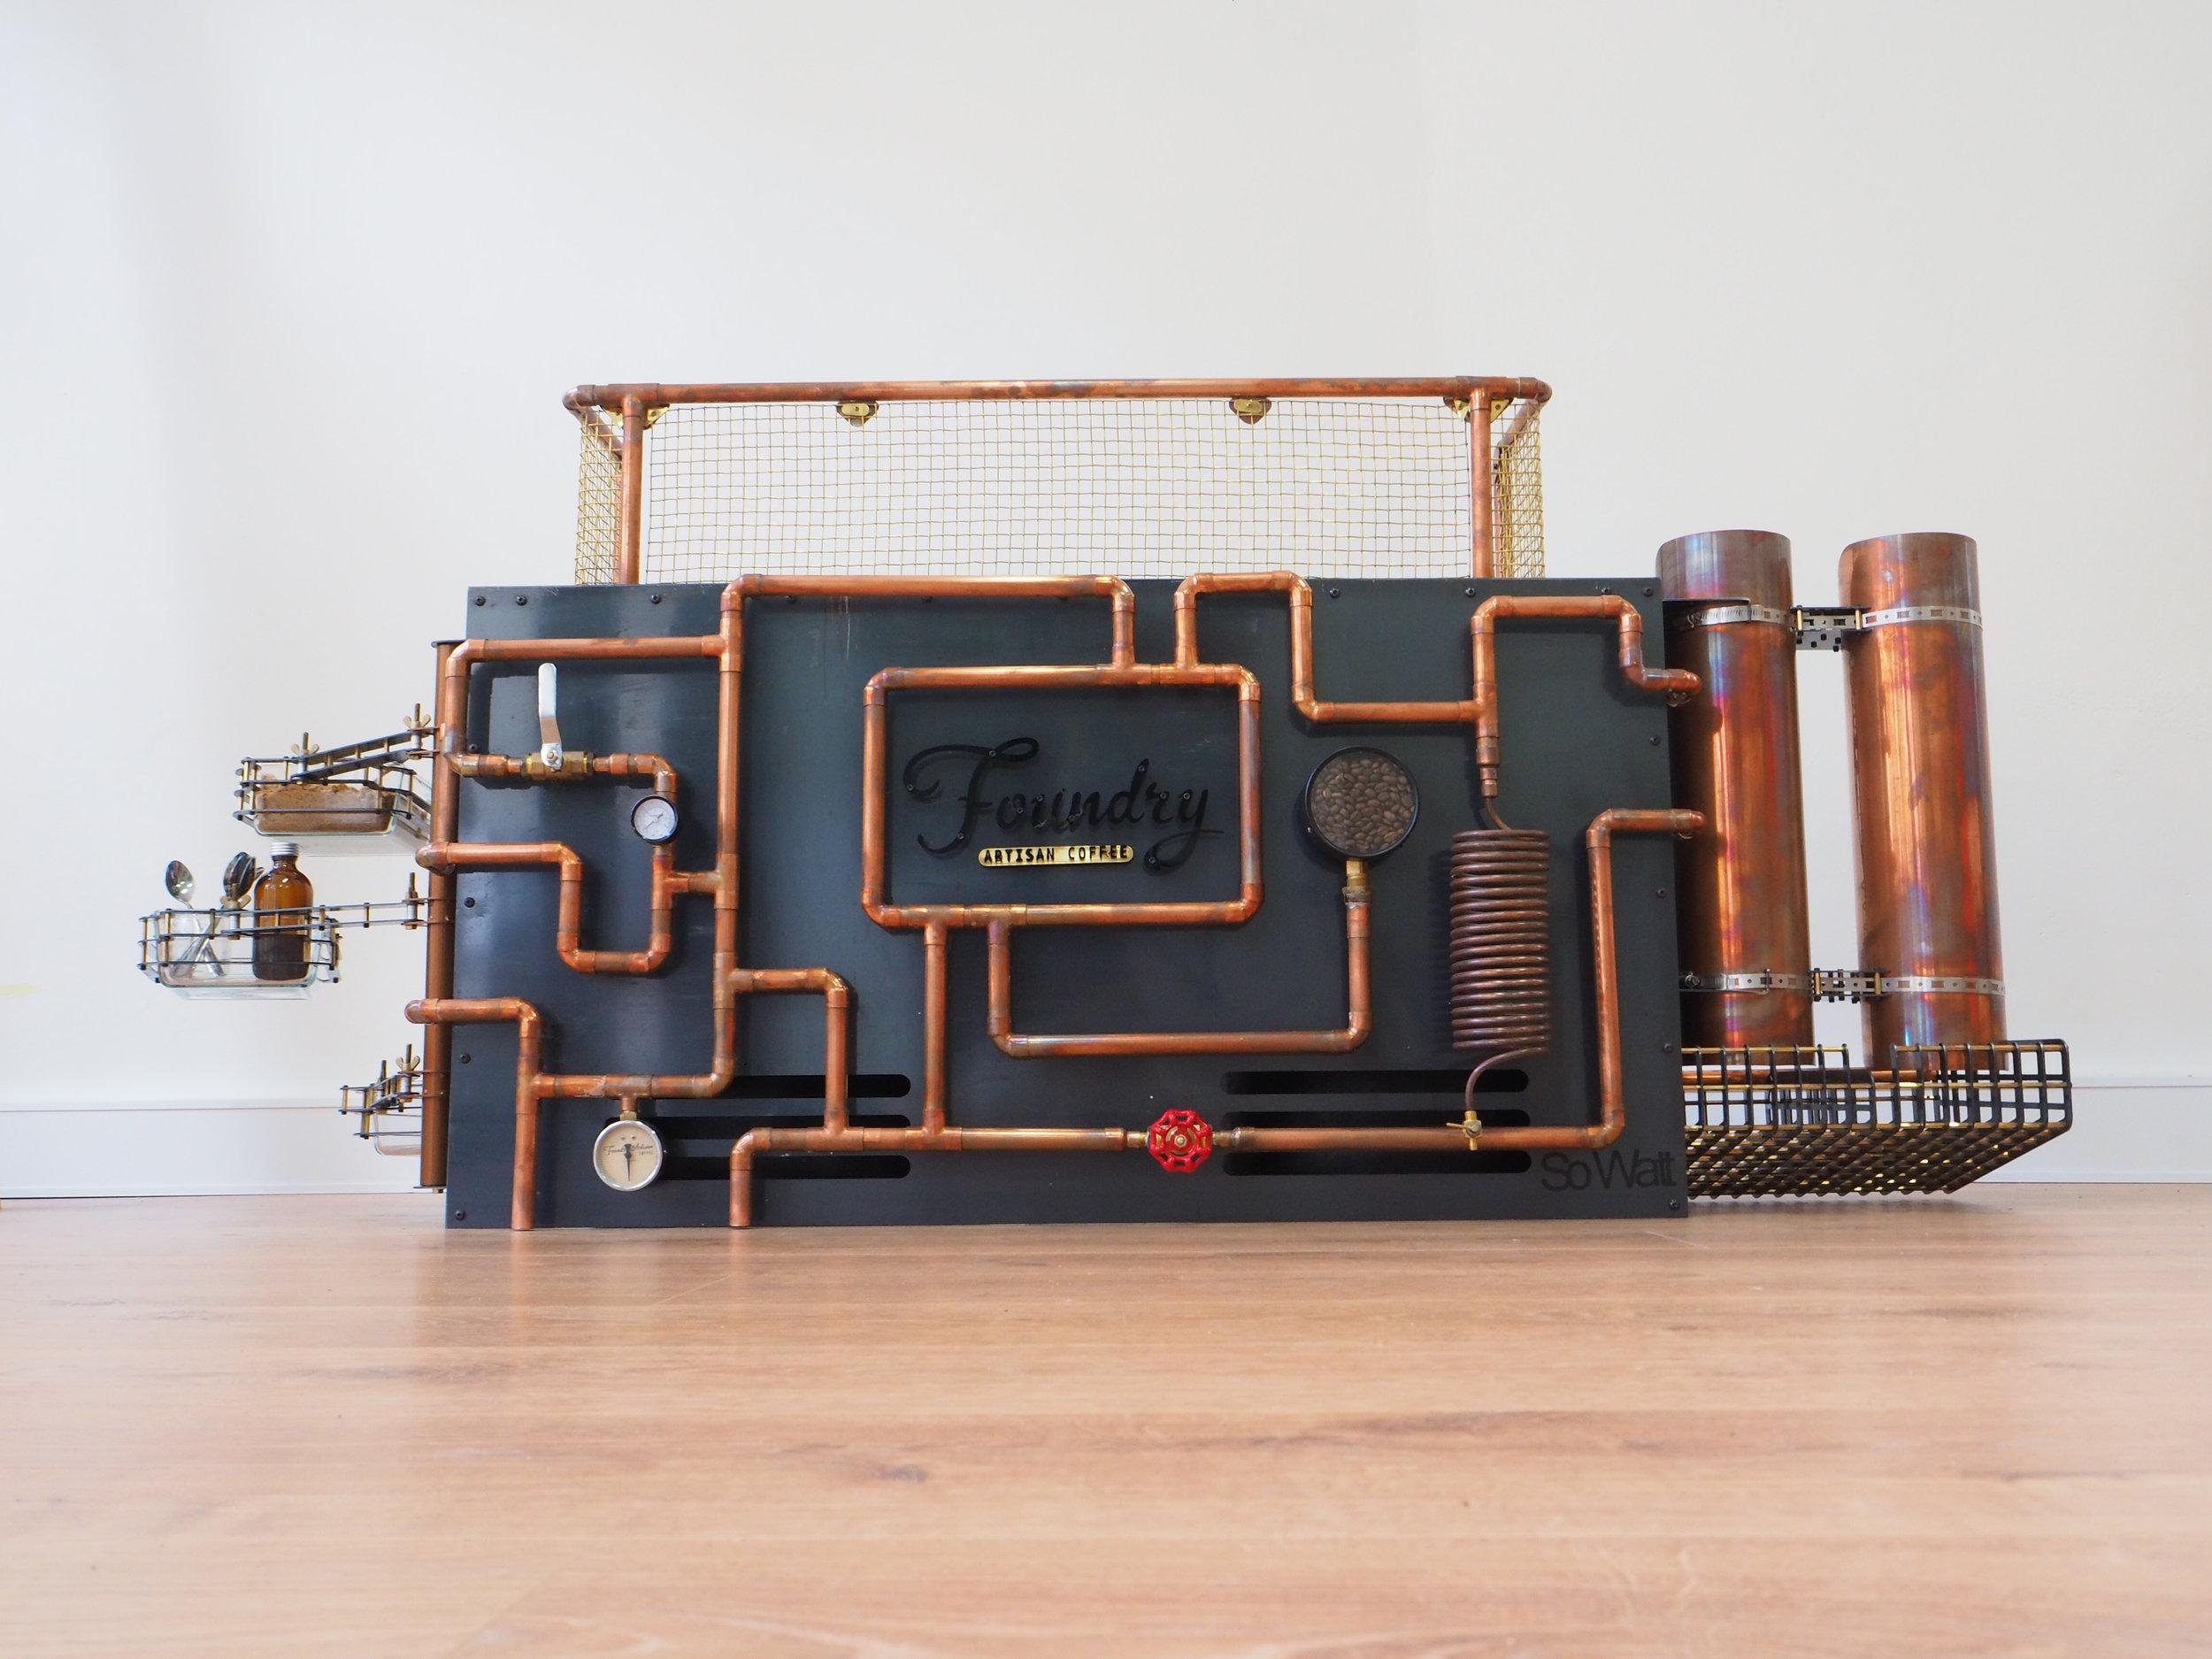 SoWatt-Foundry-Cafe-Custom-Coffee-Steel-Surround-10.JPG